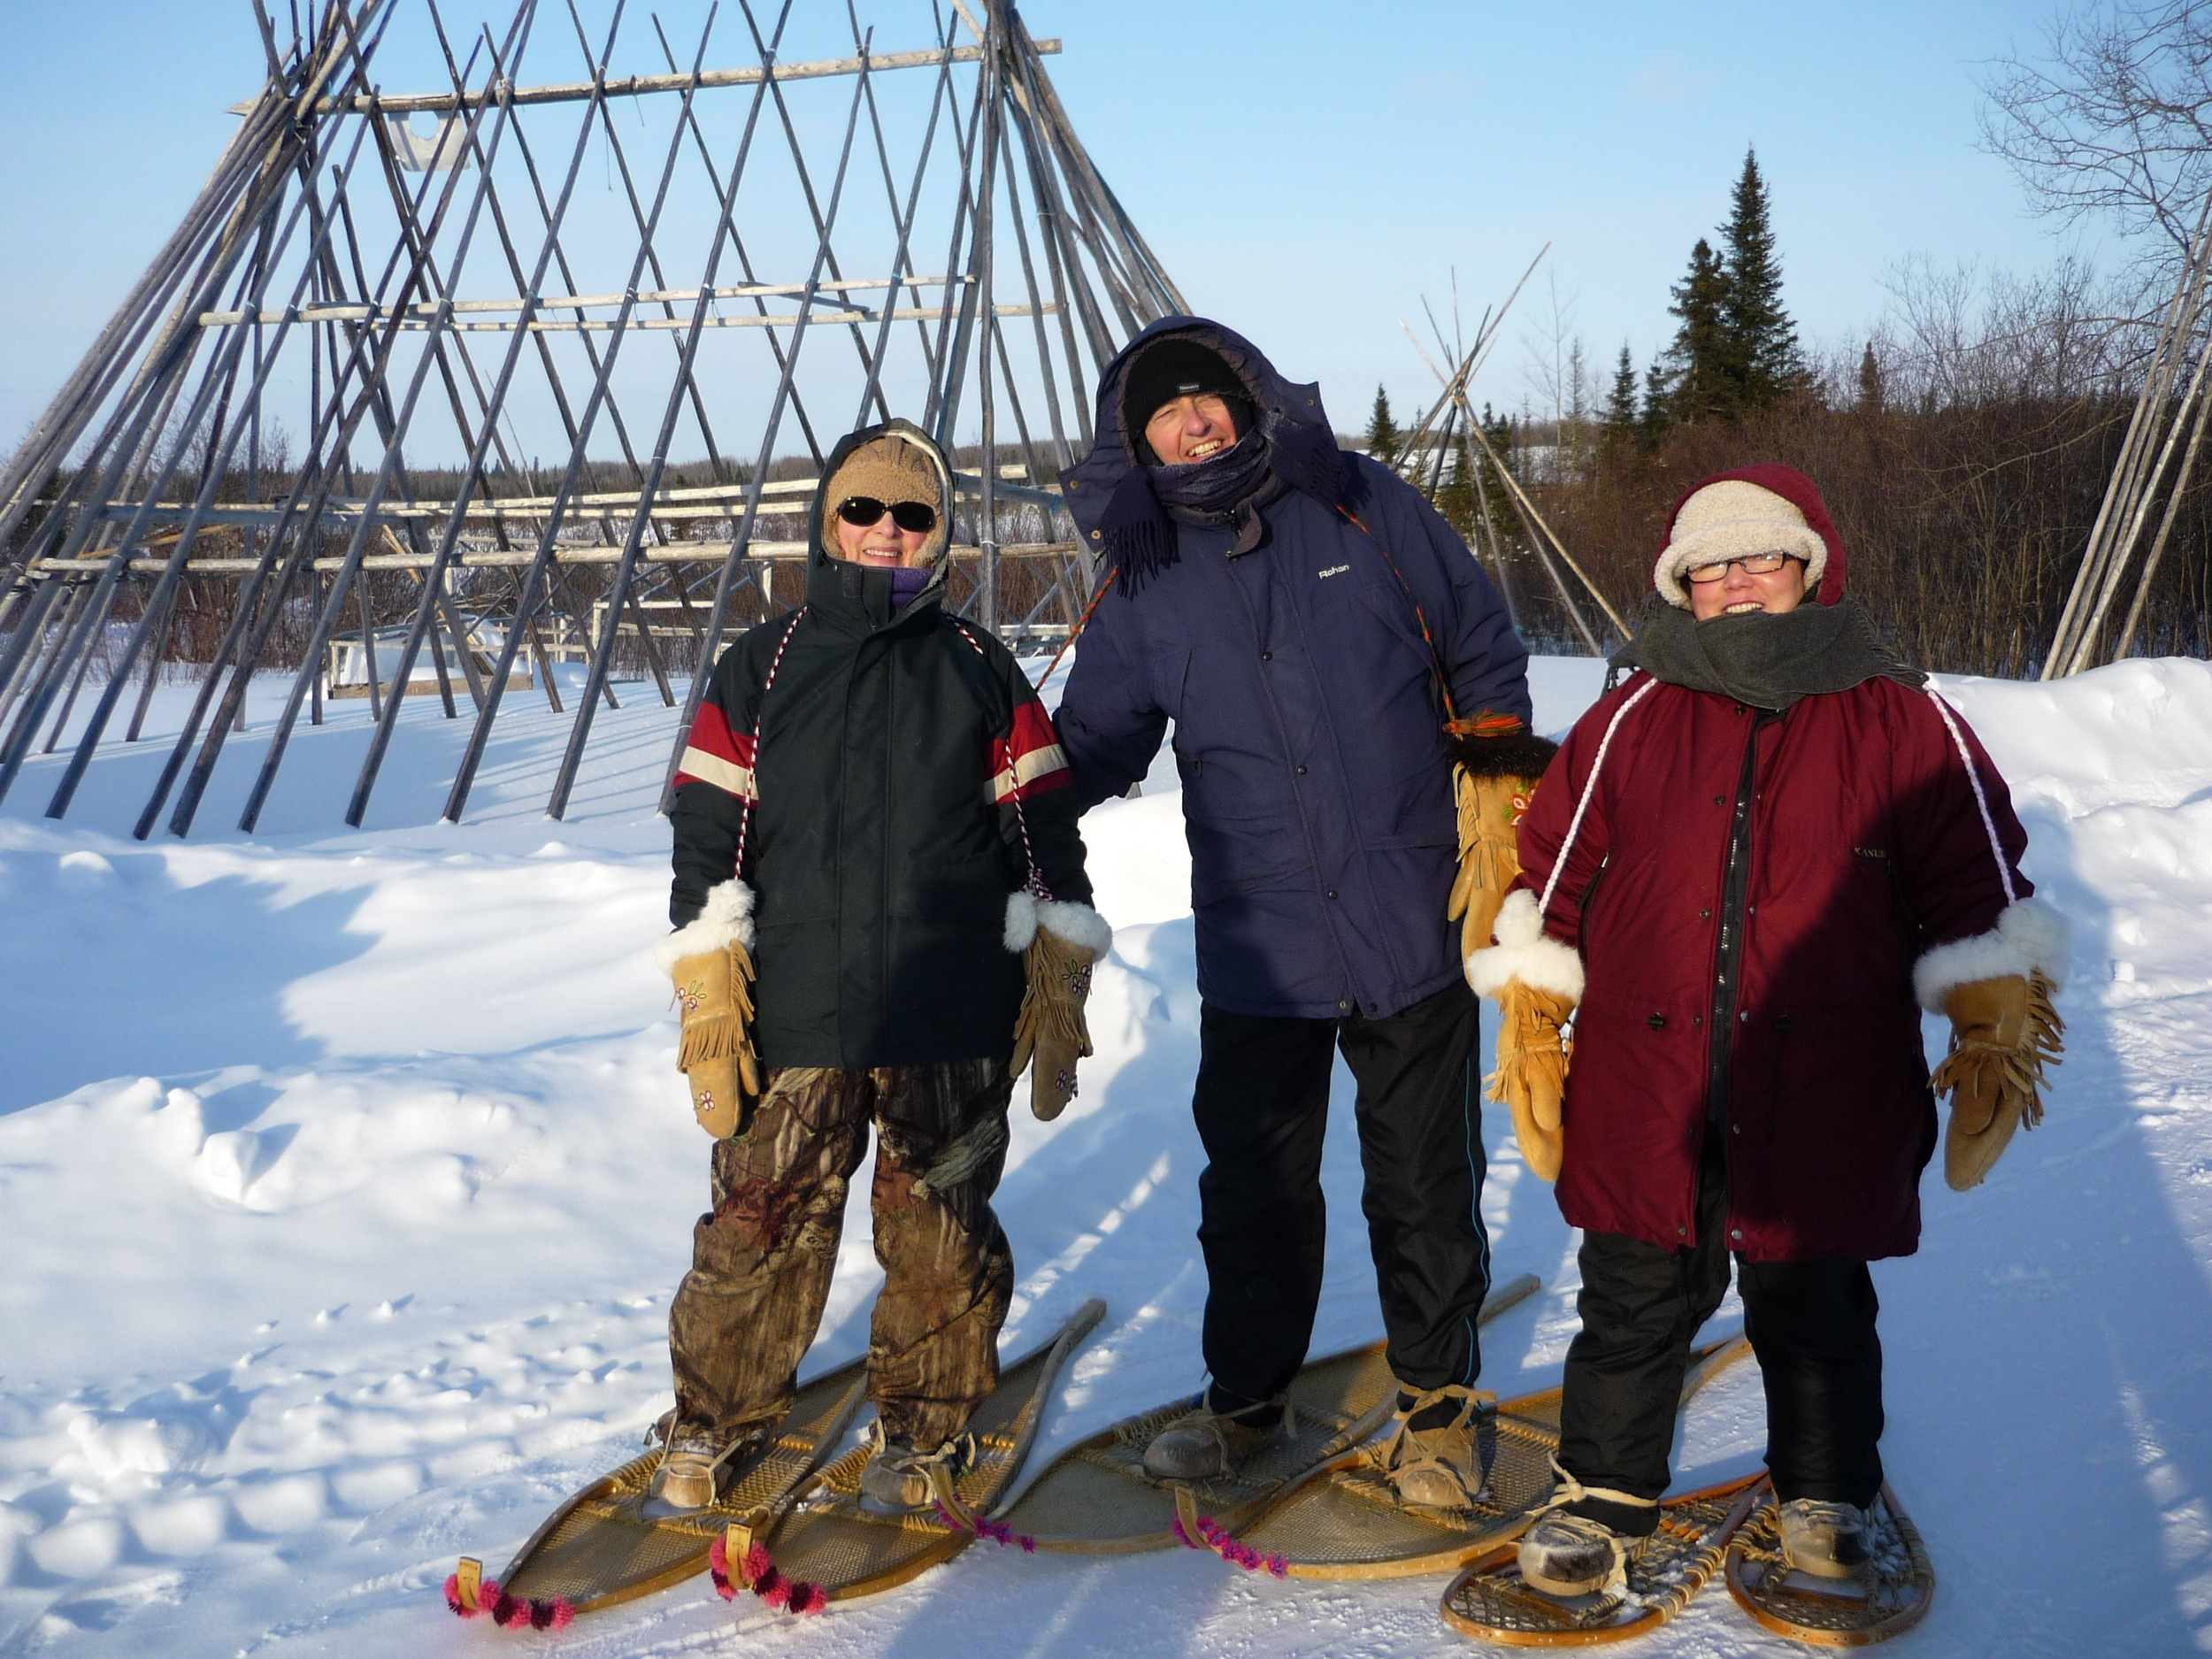 Snow-shoeing in Waskaganish, Canada